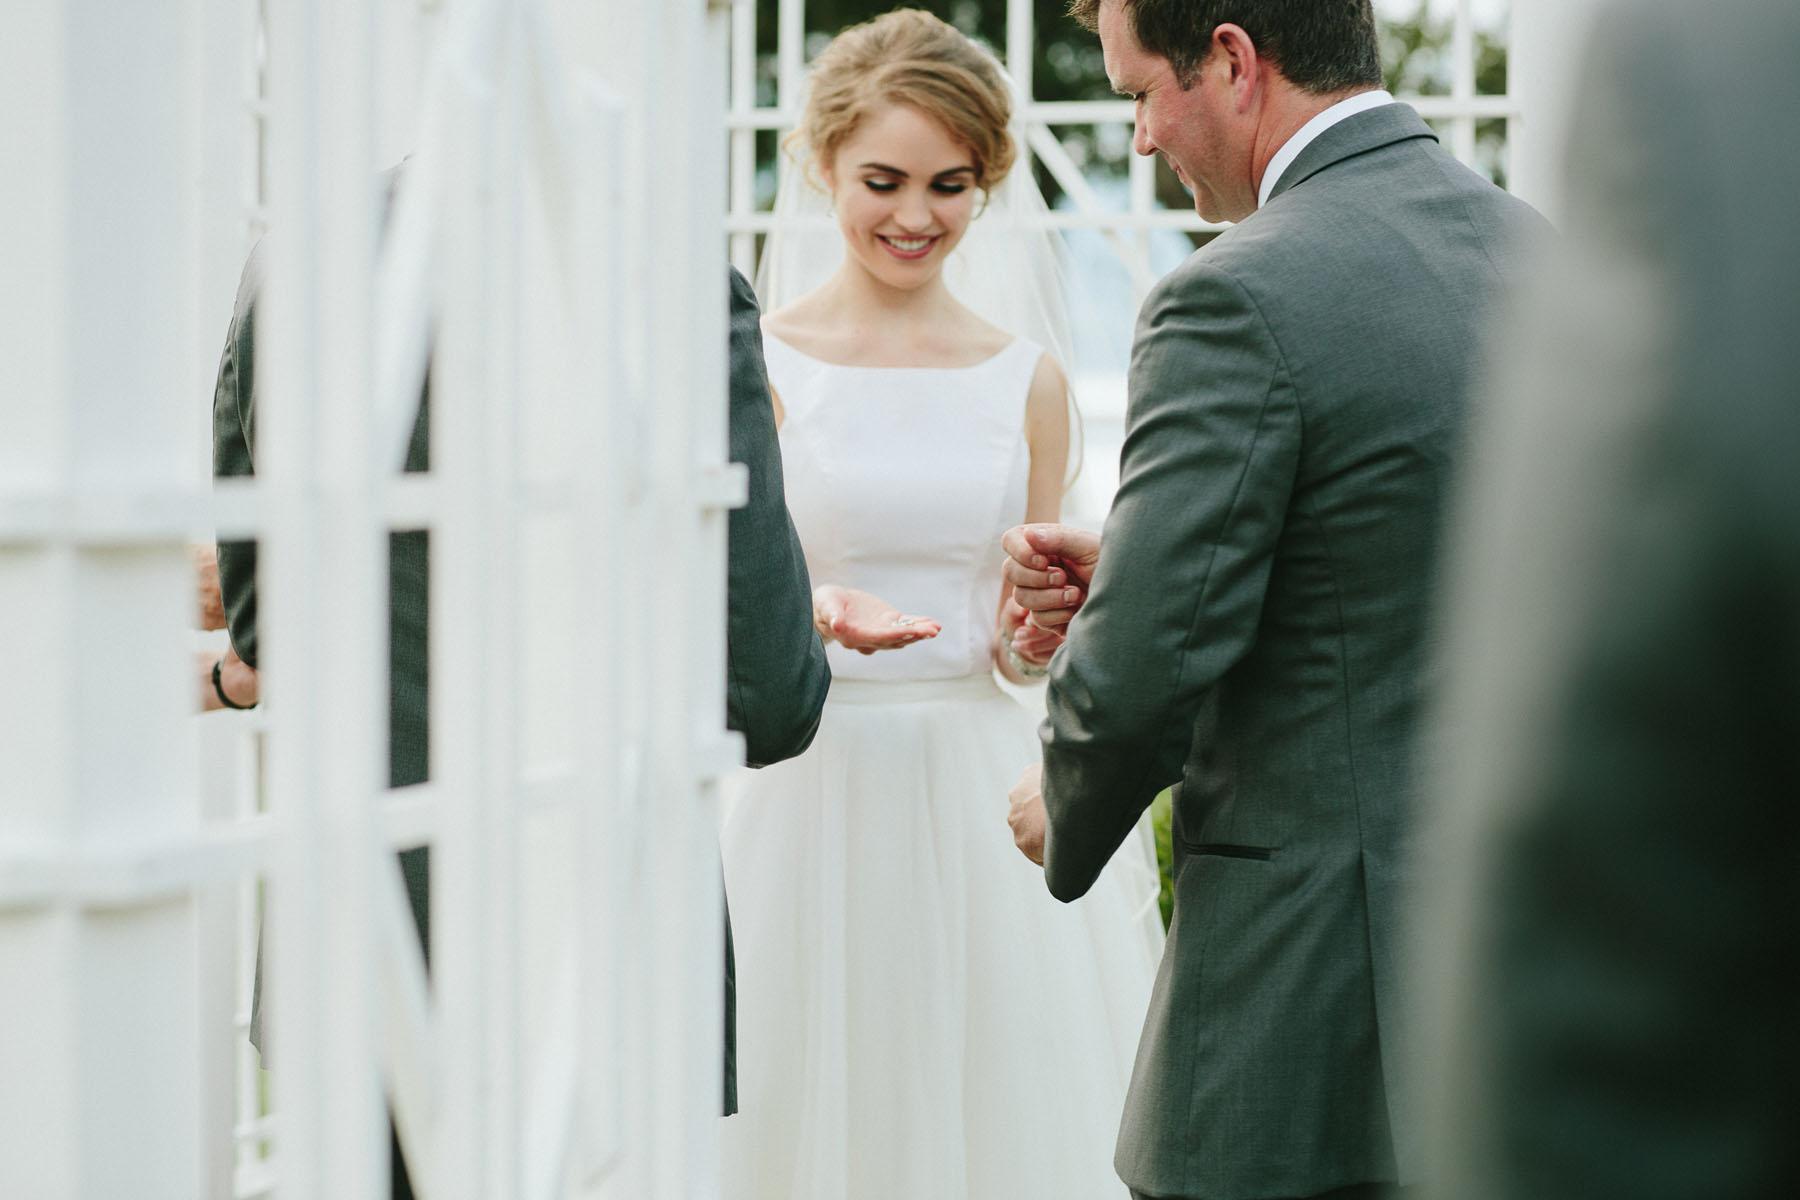 thetis-island-wedding-photographer-rp-rn-091.jpg